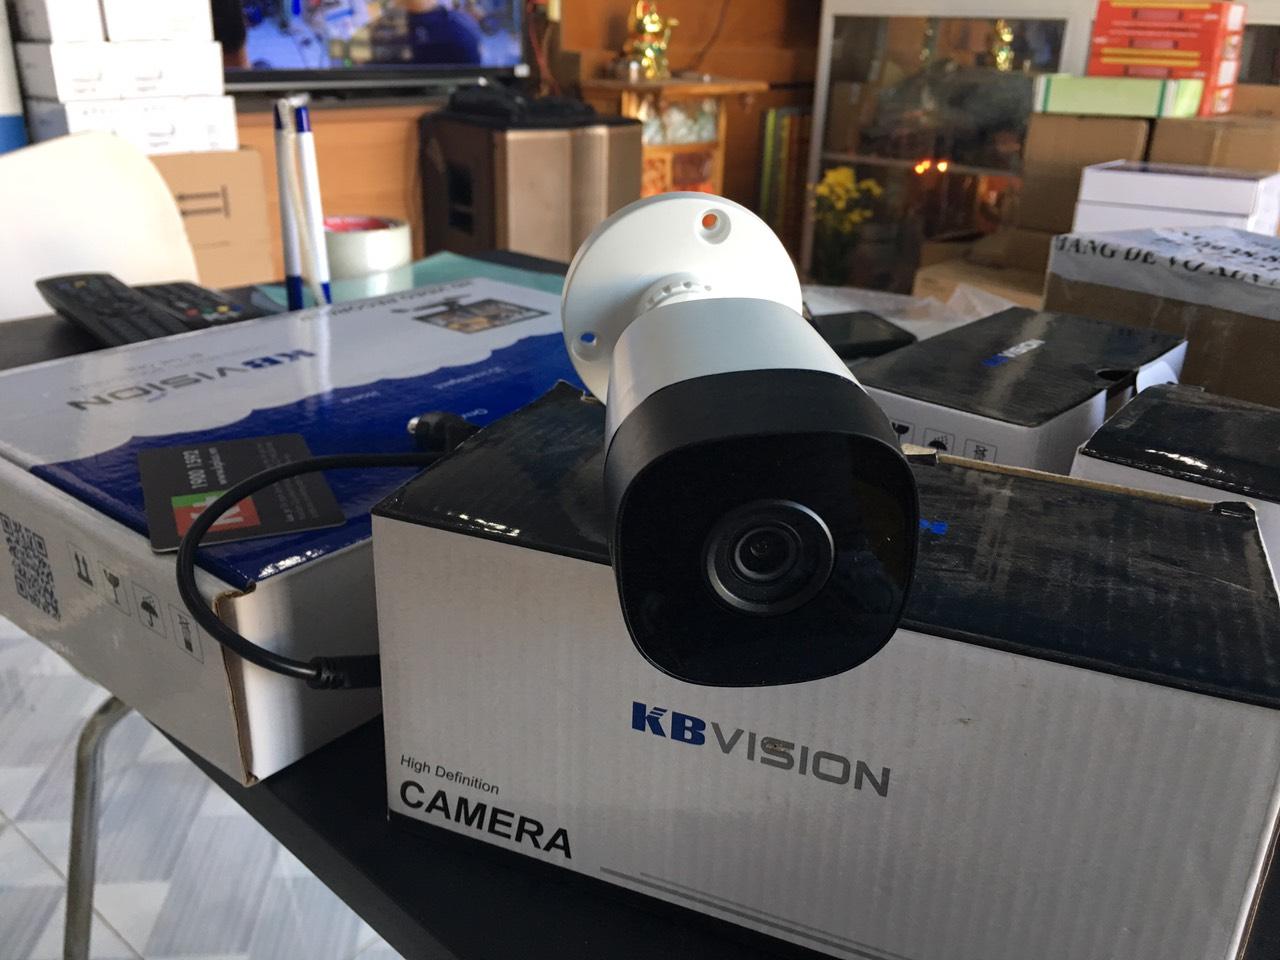 camera tại kcn nam tan uyen